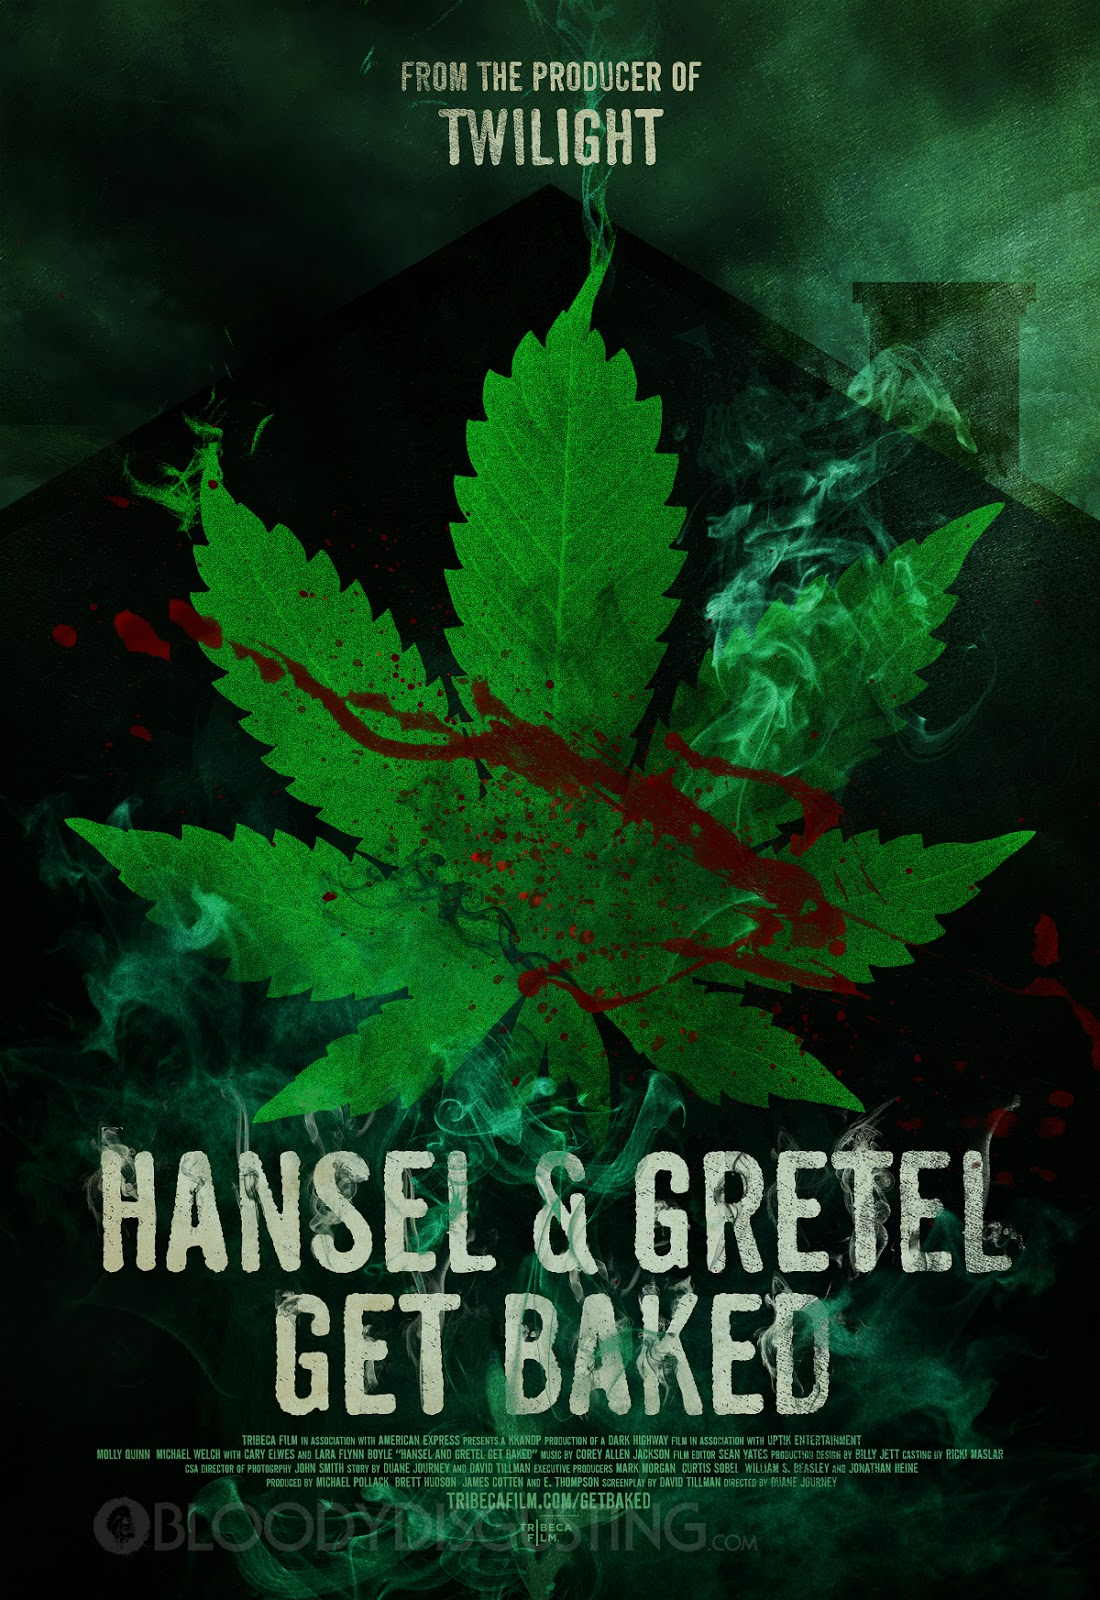 http://2.bp.blogspot.com/-3Washoba2Oc/URJTDajSiCI/AAAAAAAANio/Oh3HvlQYcv4/s1600/Hansel+&+Gretel+Get+Baked.jpg